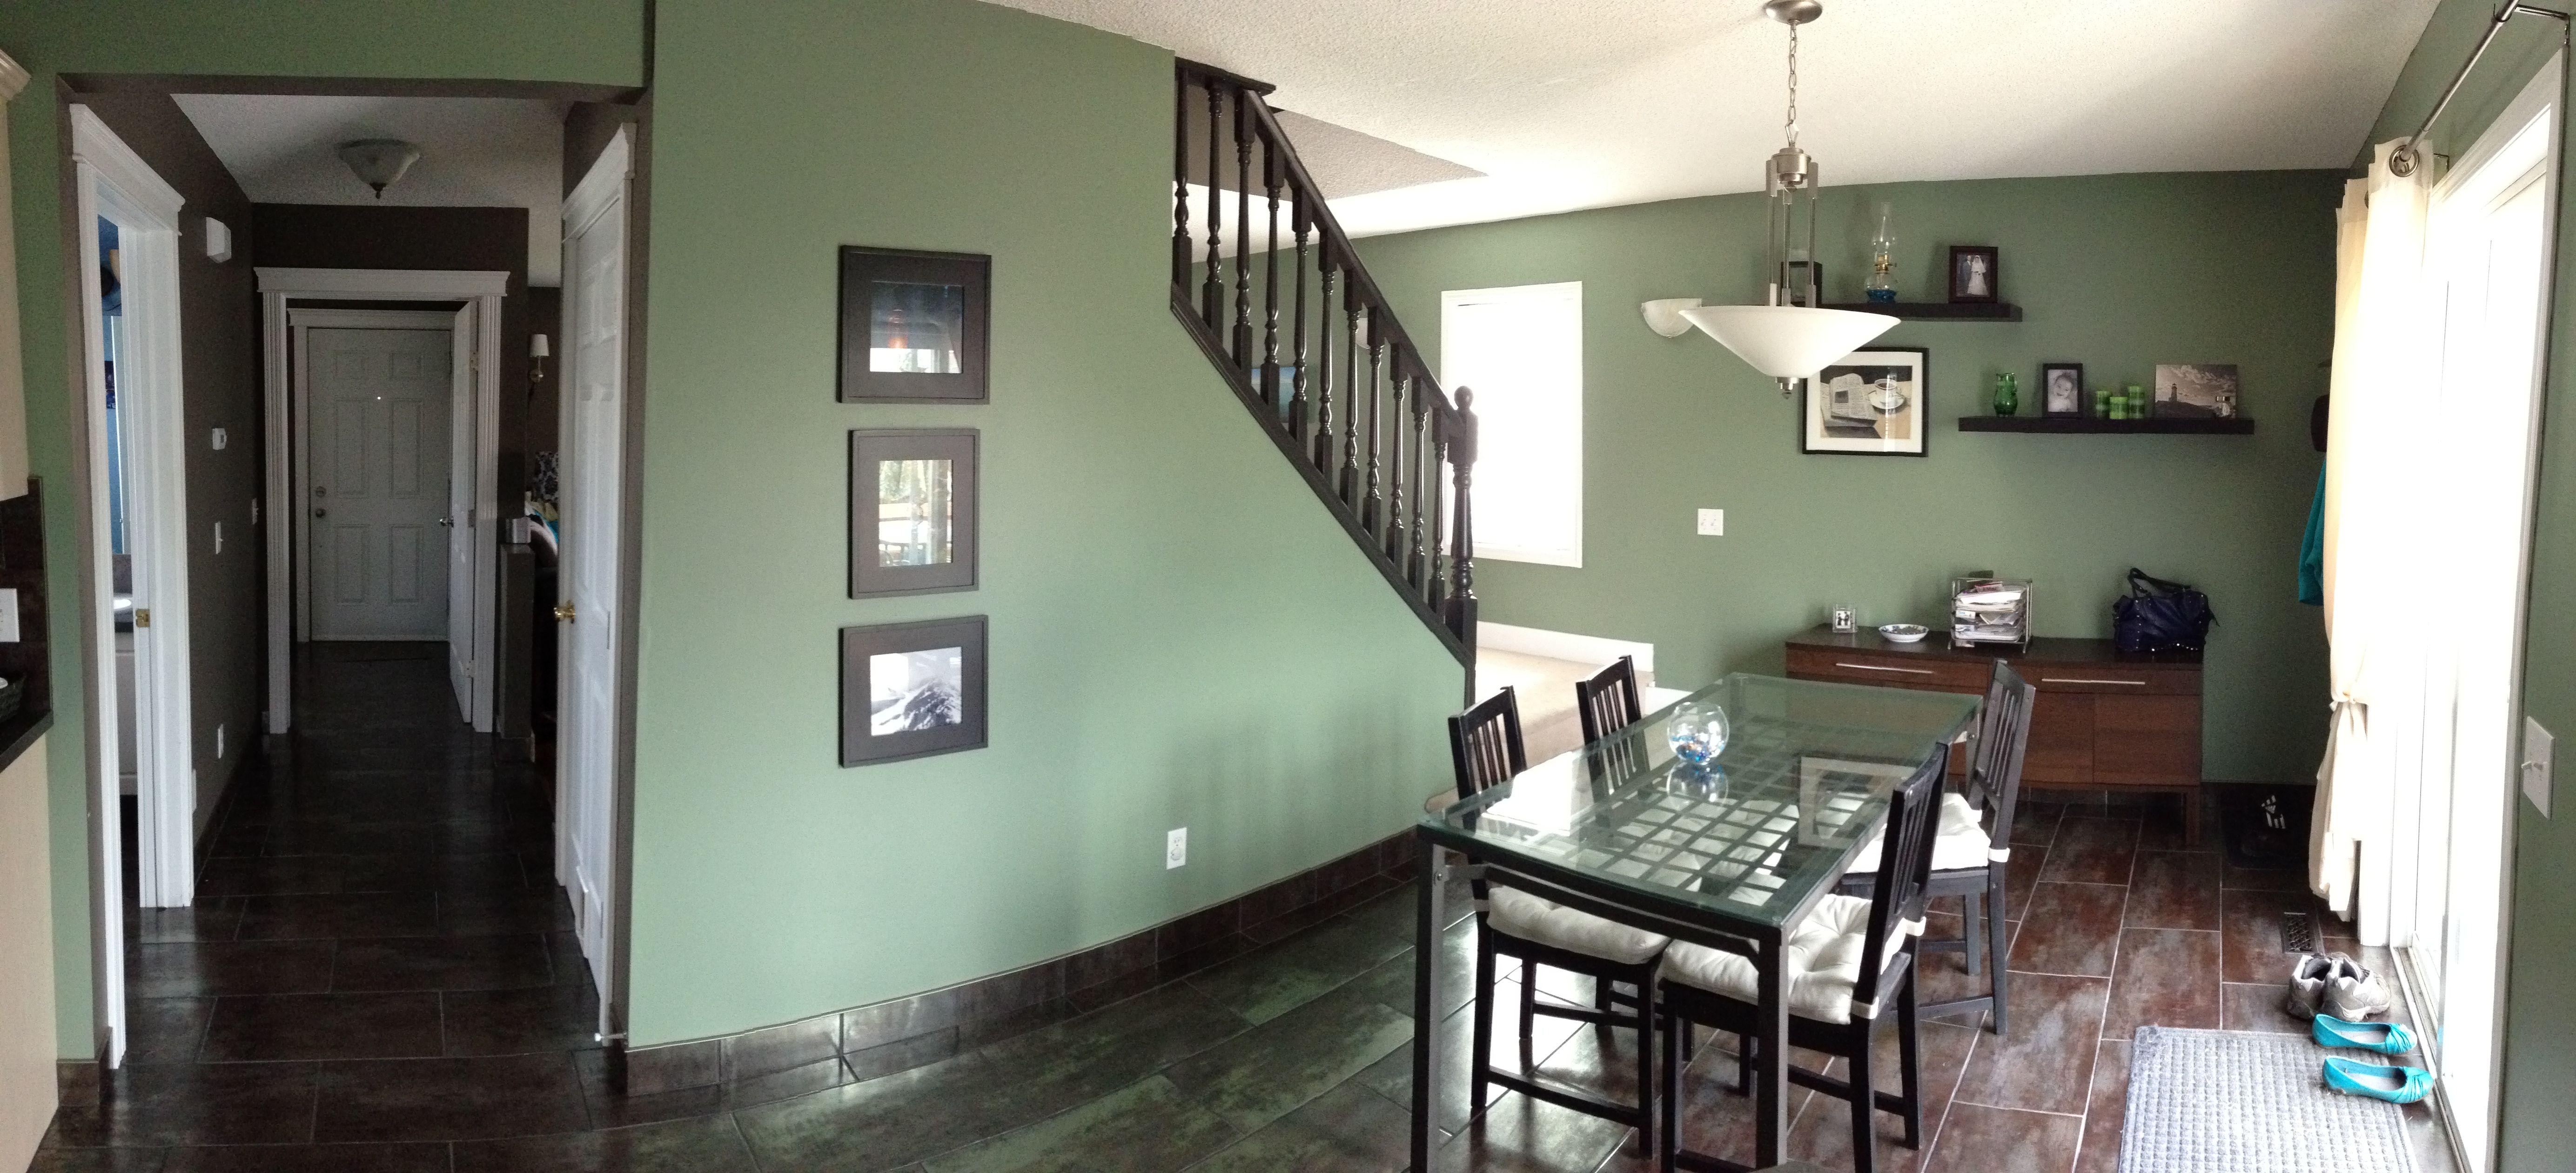 Paint Color Loving My New Green Walls Benjamin Moore High